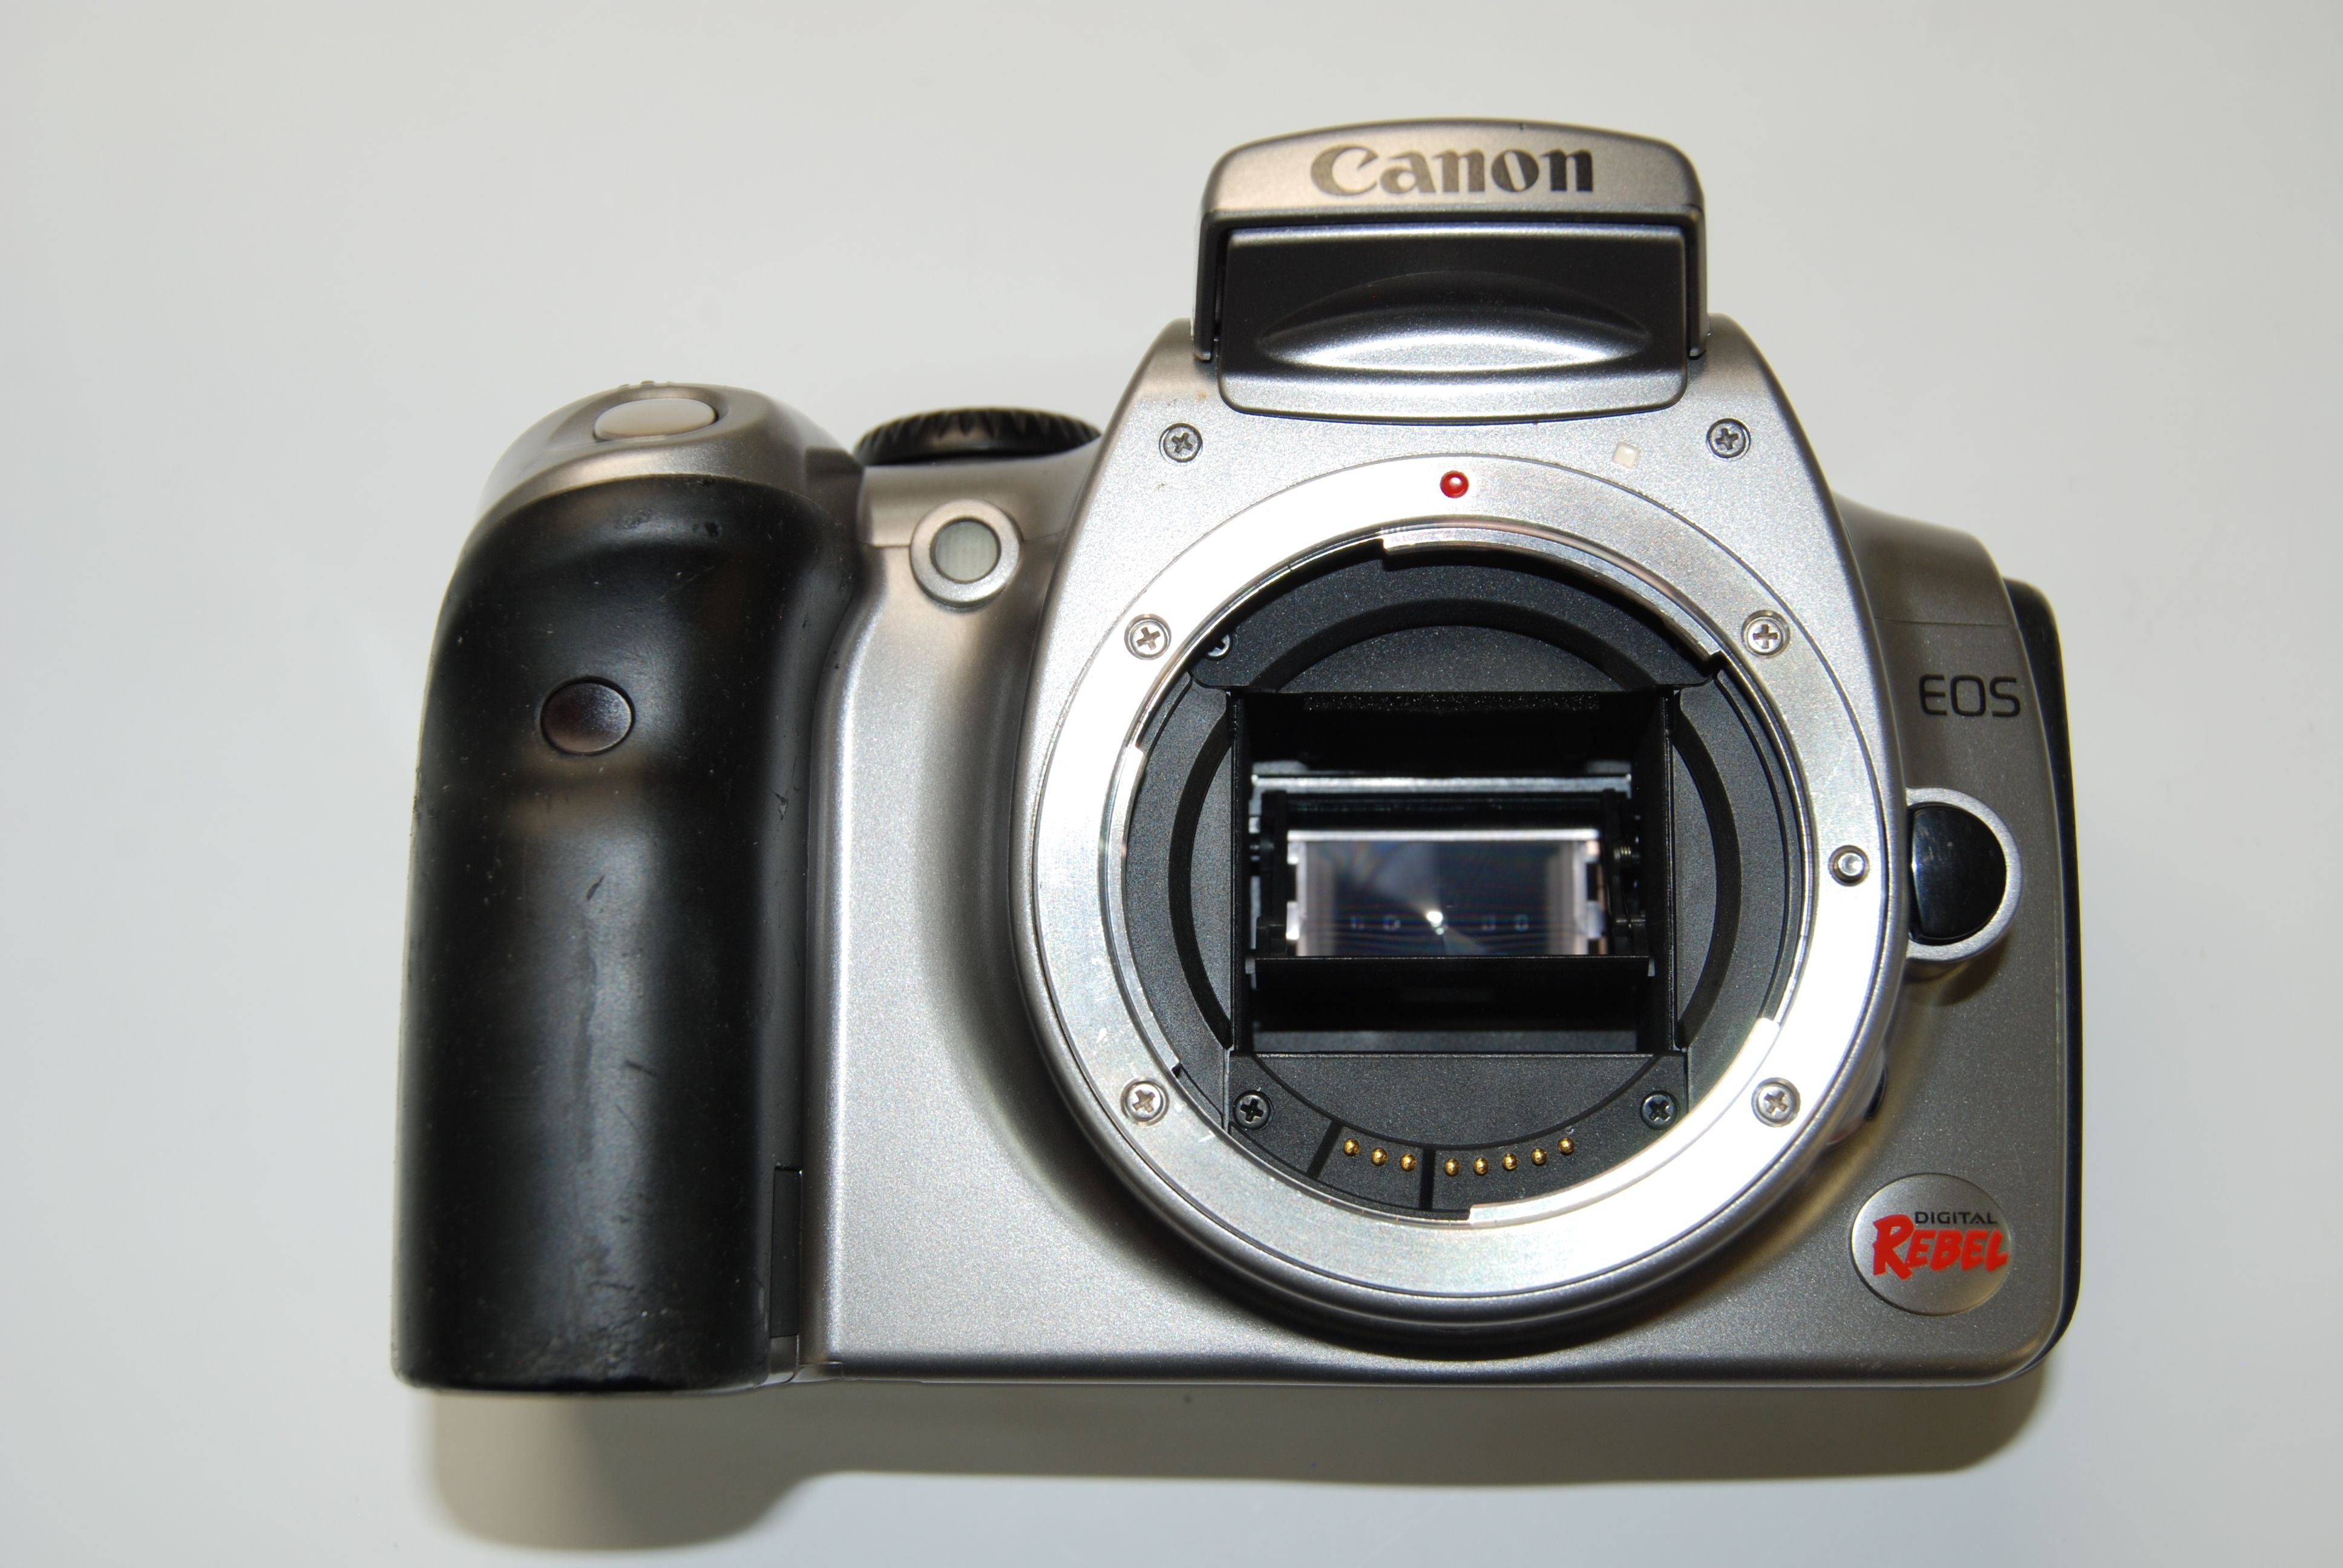 Canon EOS 300D (EOS Digital Rebel / EOS Kiss Digital) Digital Camera